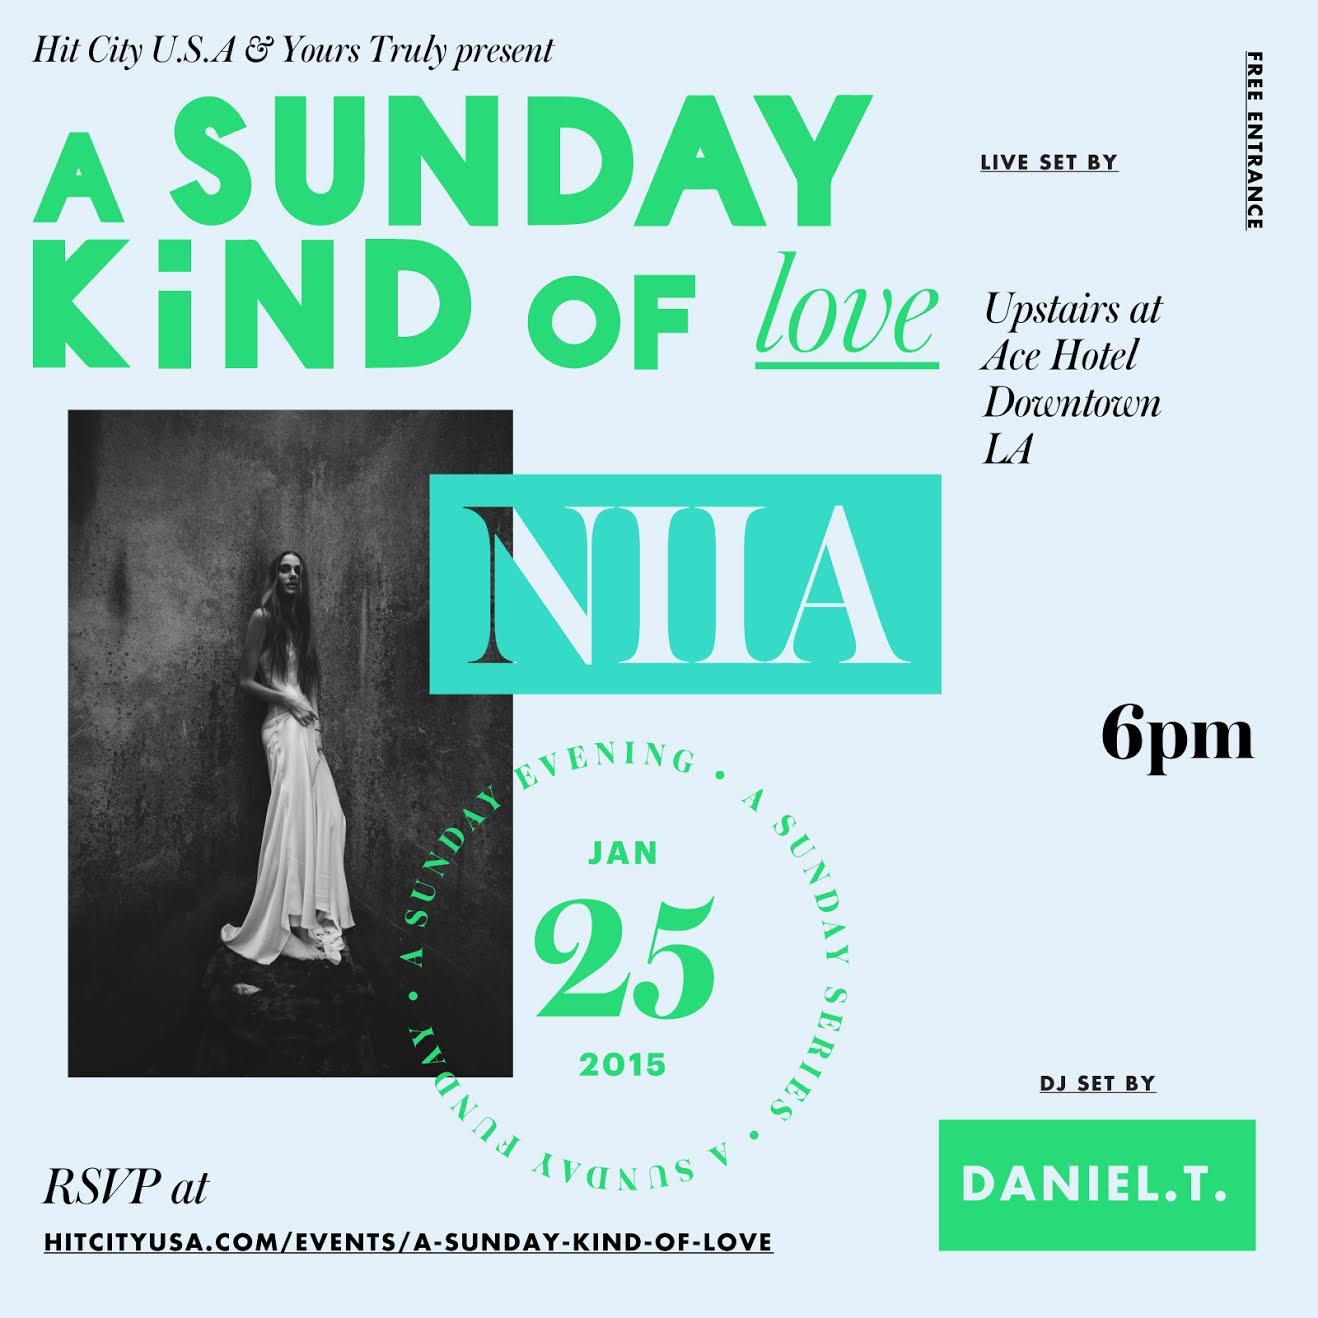 A Sunday Kind of Love w/ NIIA